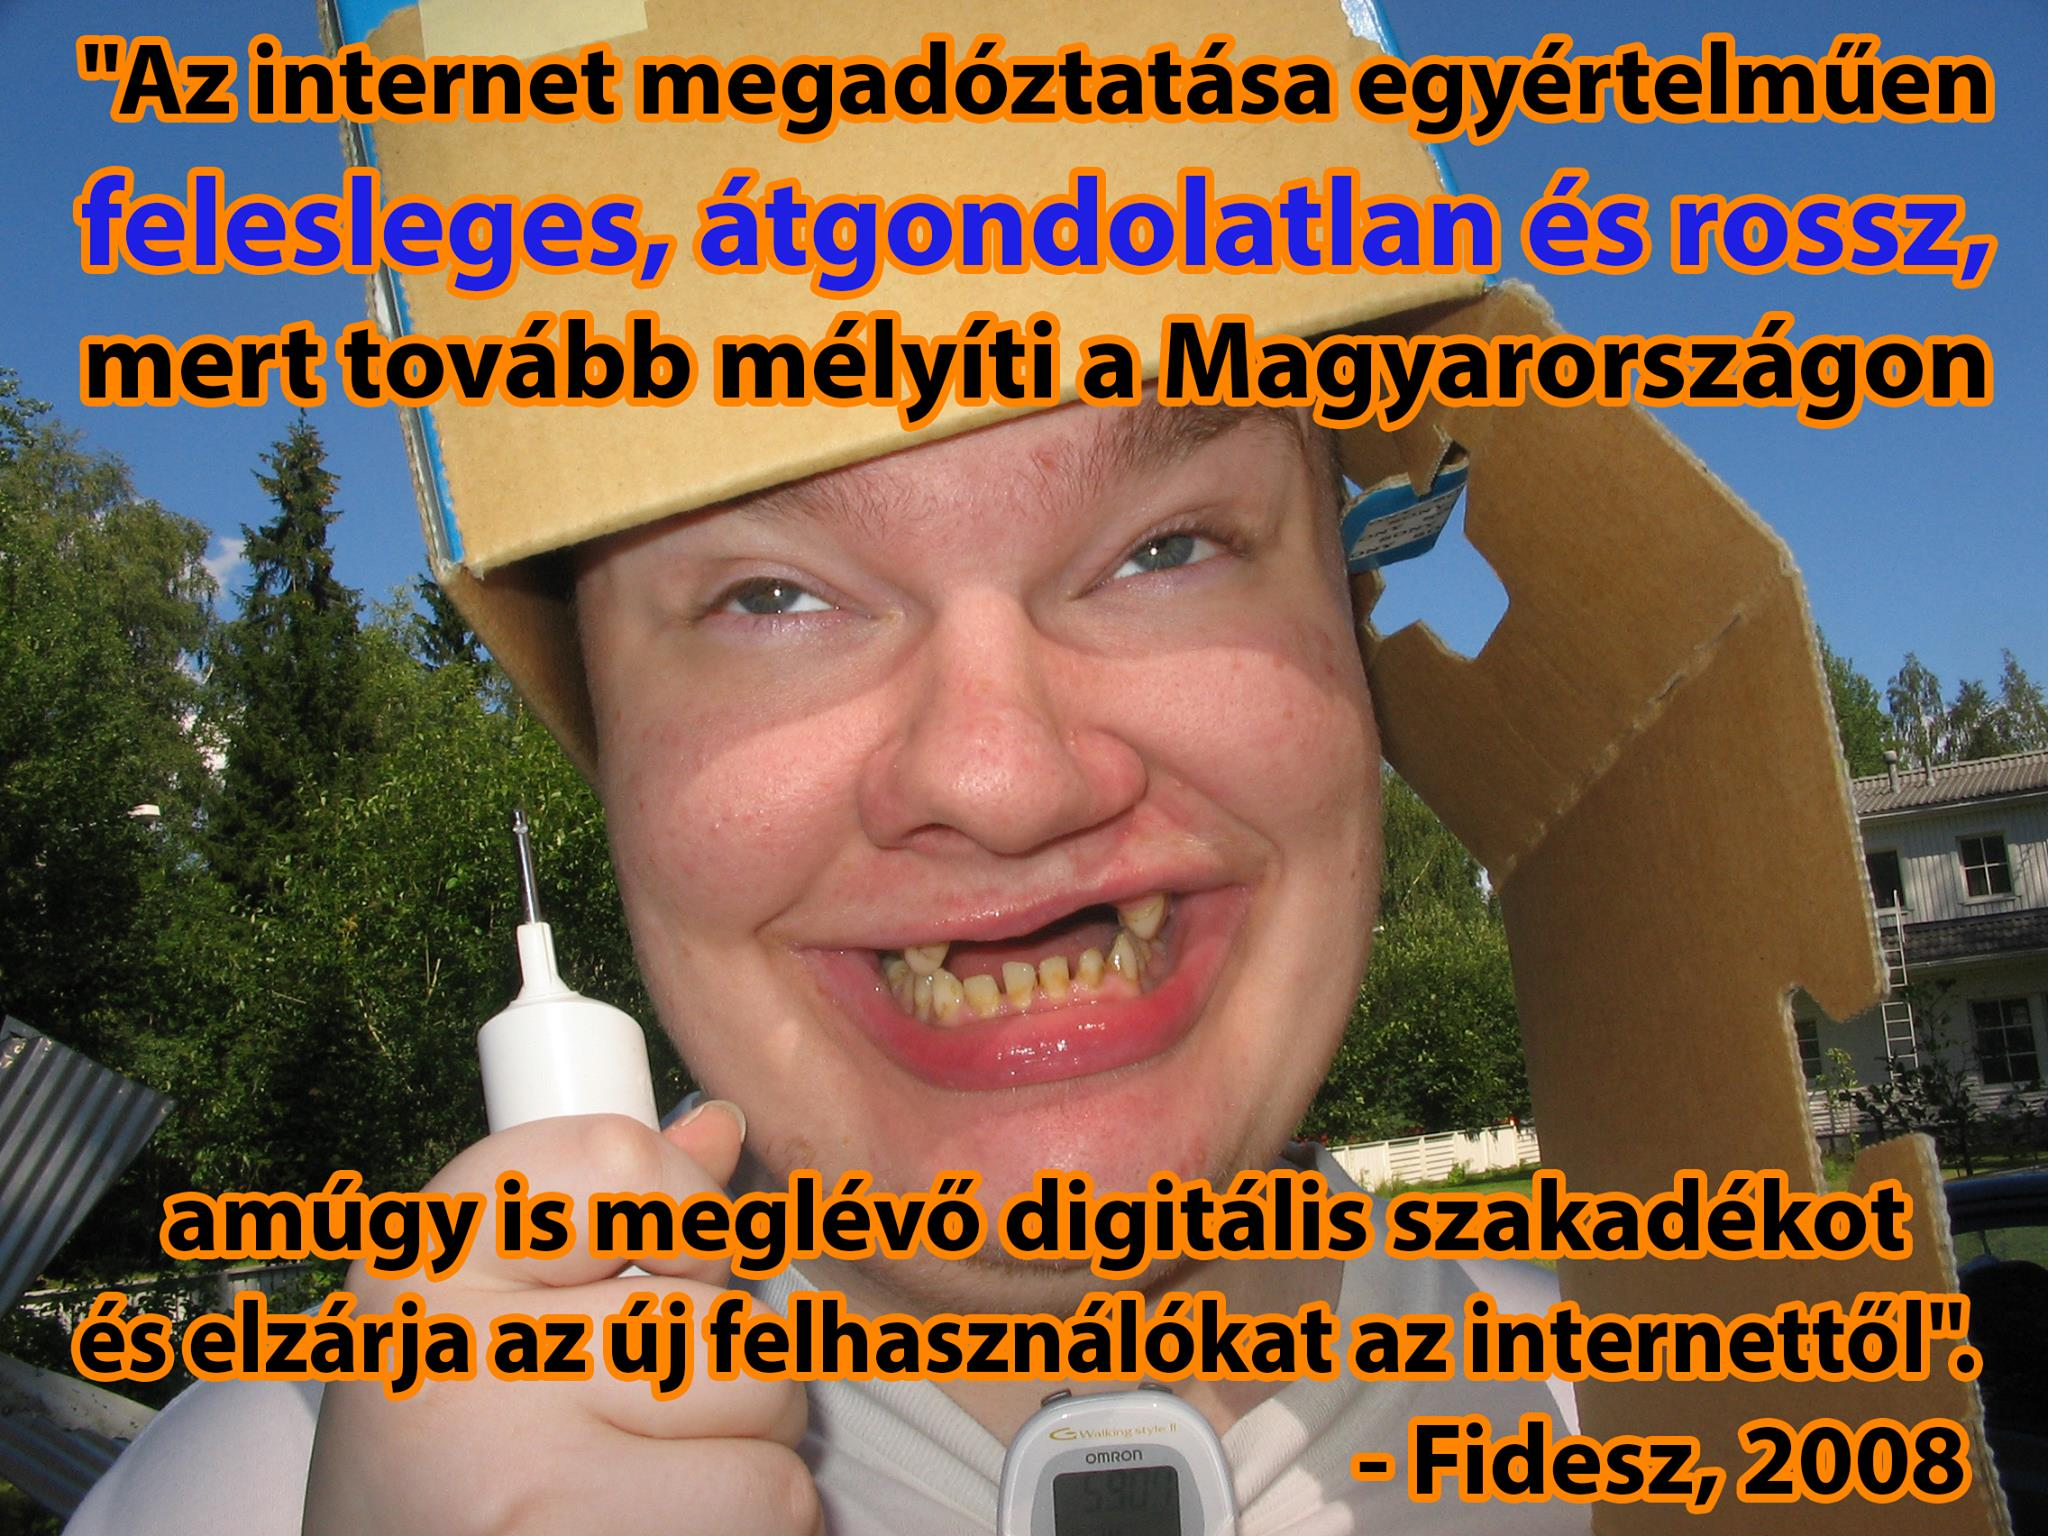 Fmpsz internet ellen.jpg